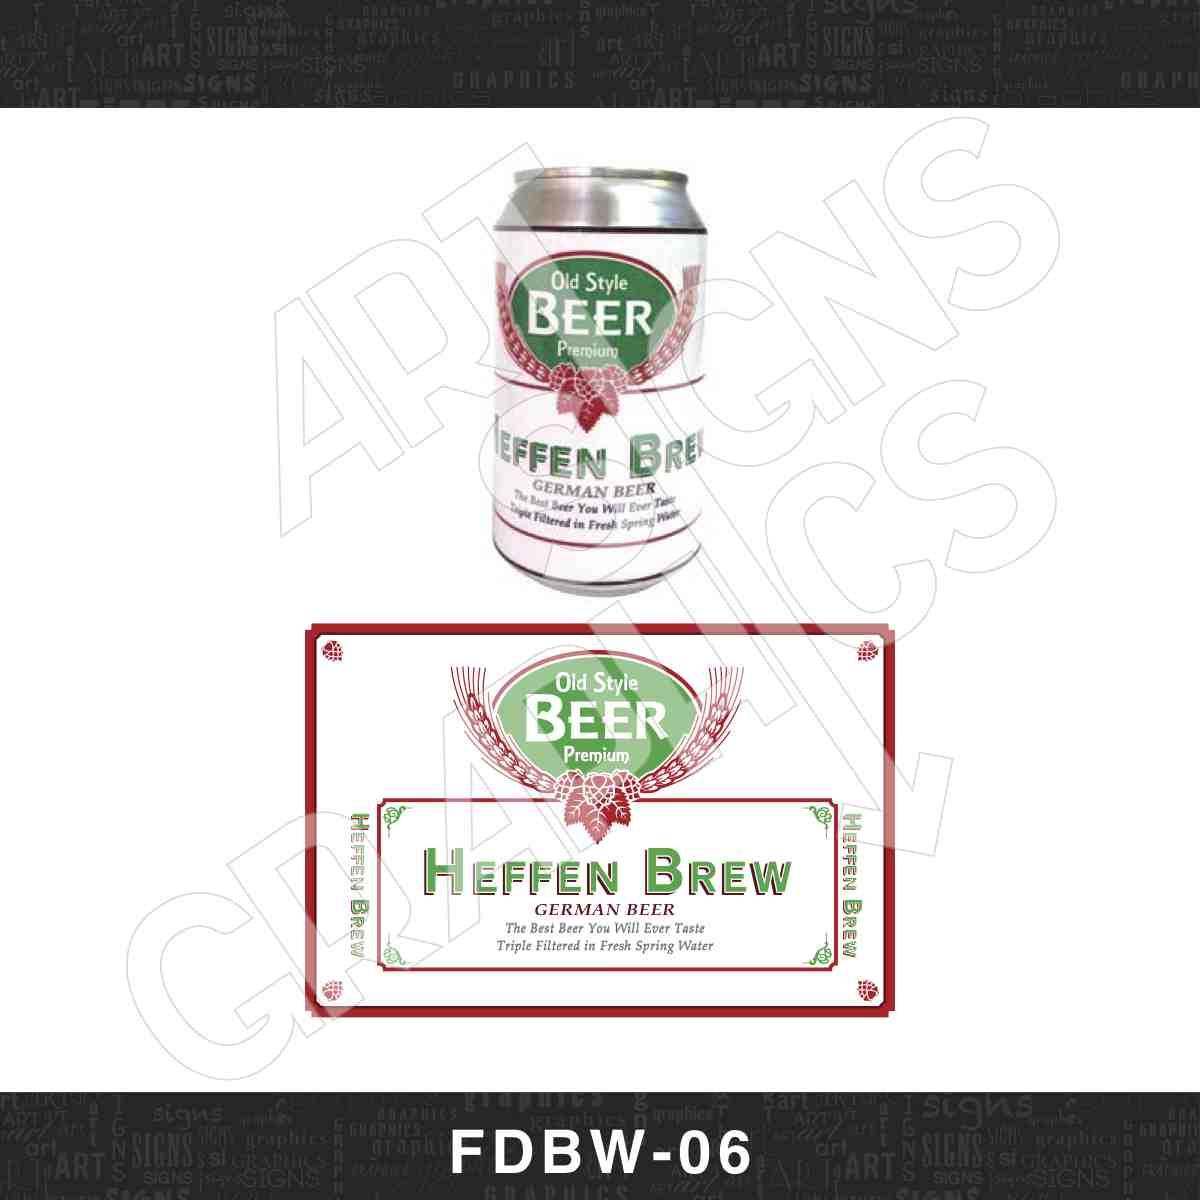 FDBW-06.jpg